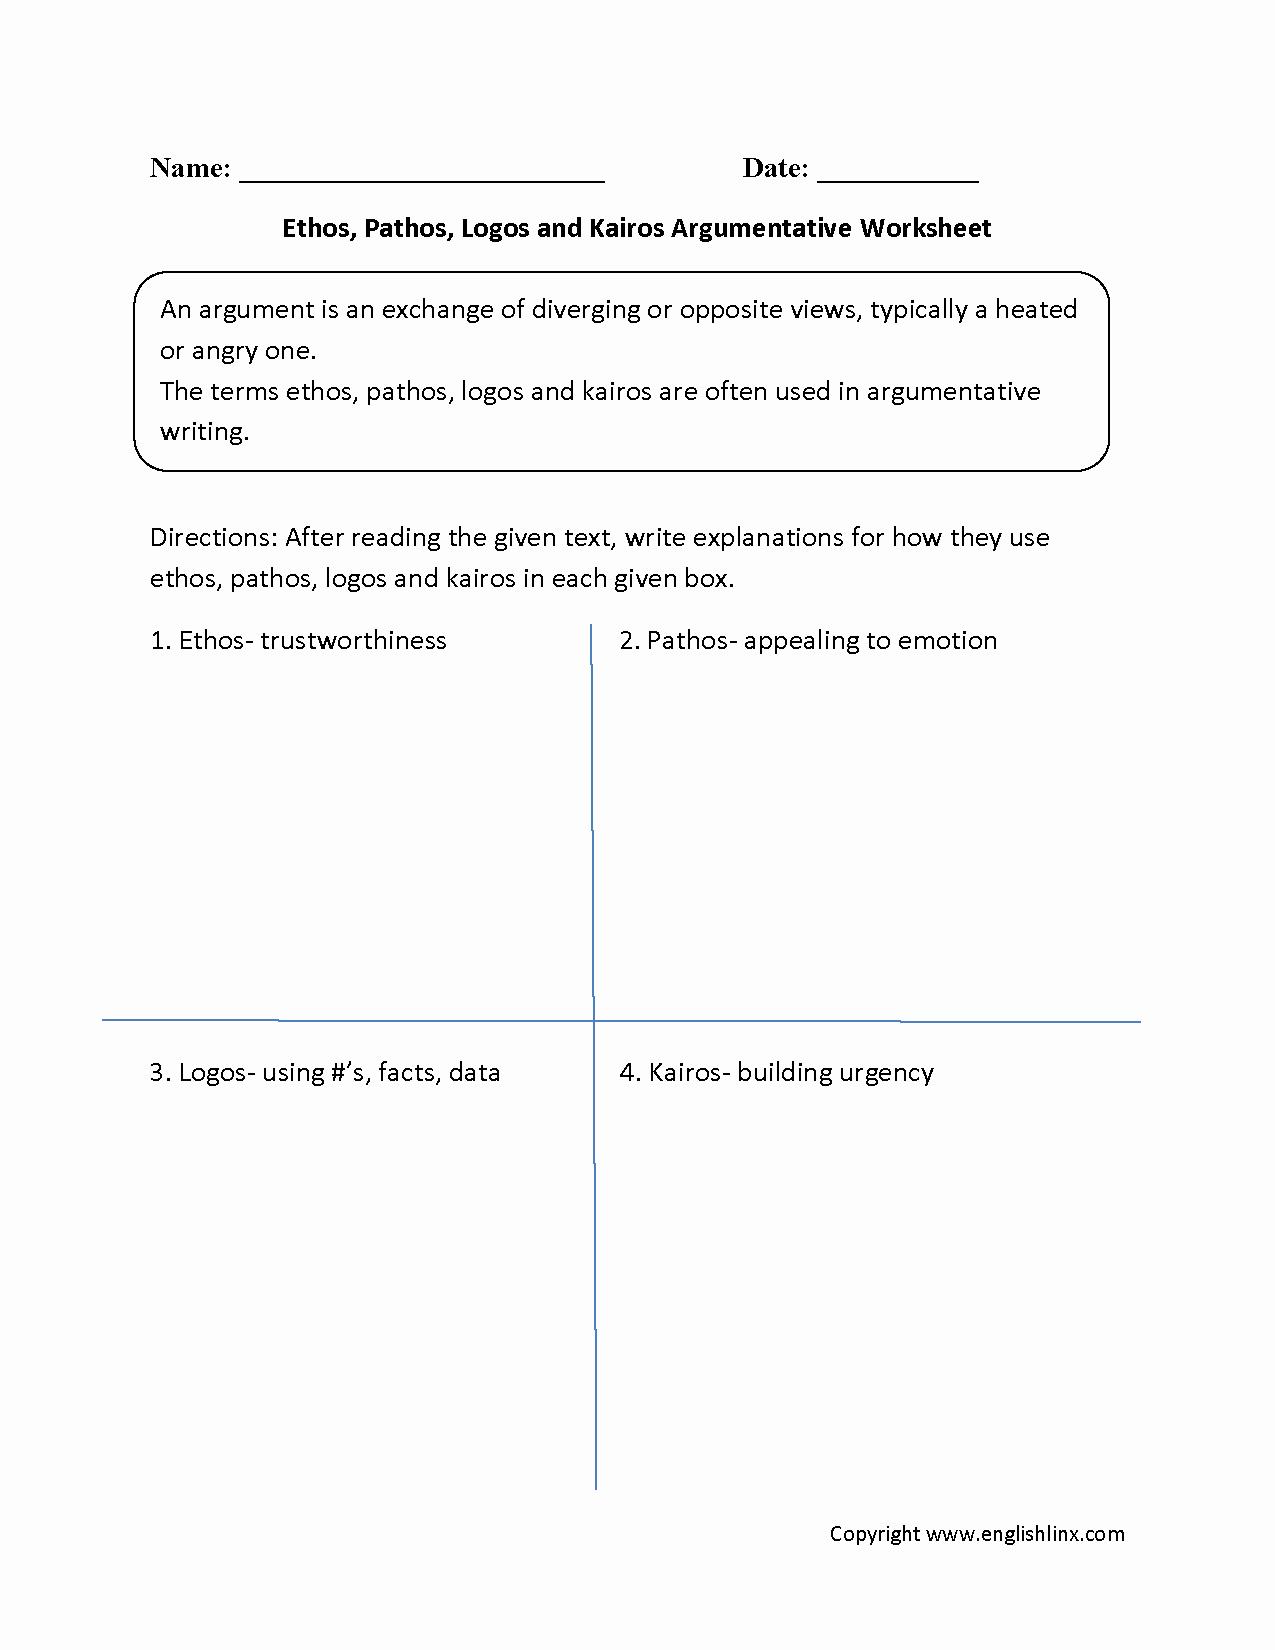 Ethos Pathos Logos Worksheet Answers Fresh Persuasive Essay Logos Ethos Pathos and Kairos Nav Menu